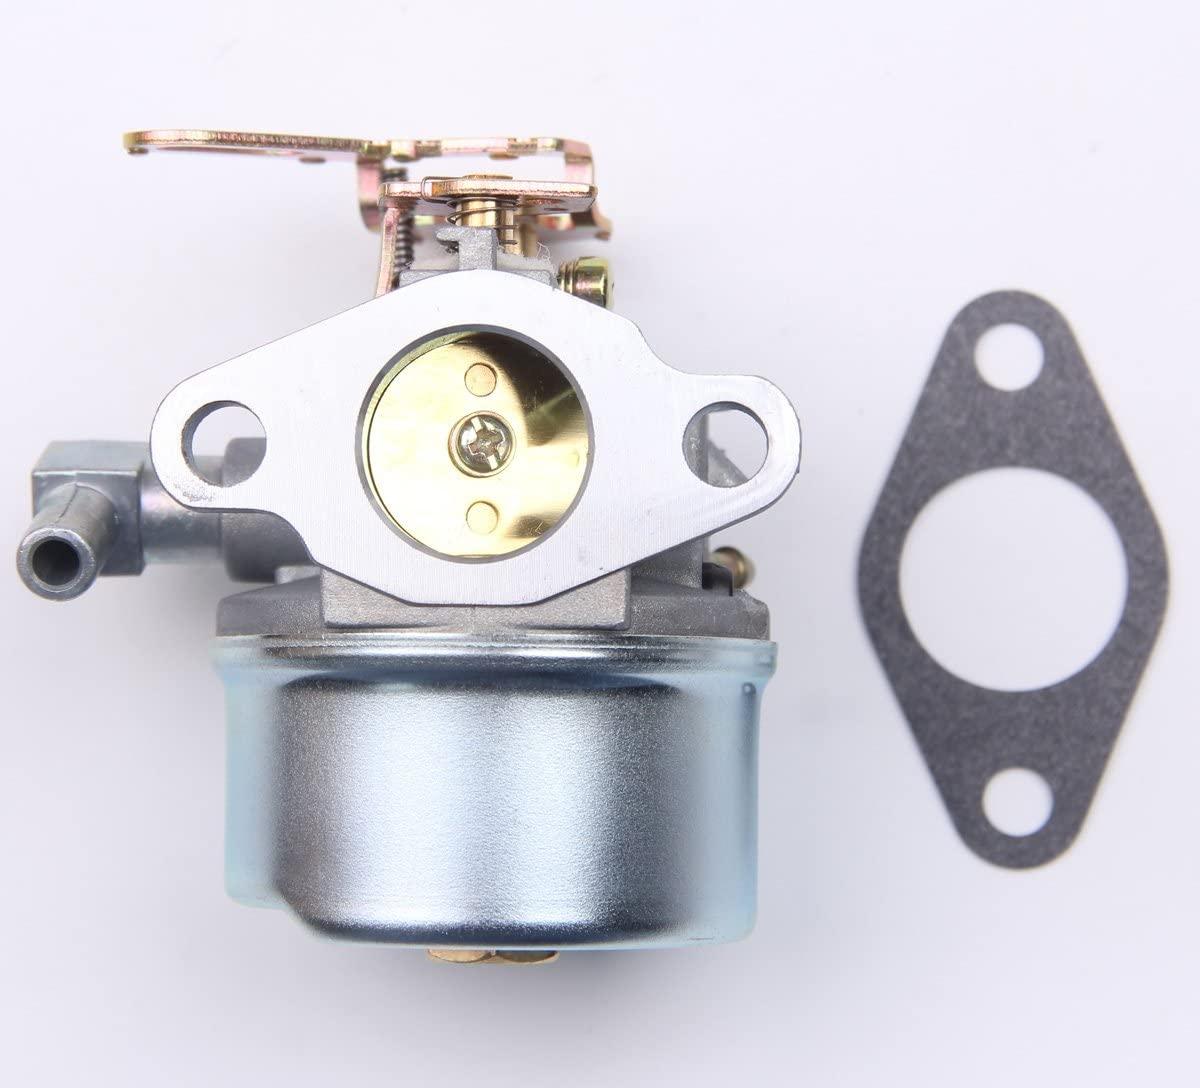 goodbest New Snowblower Carburetor for Tecumseh 5HP MTD 632107A 632107 640084A 640084B